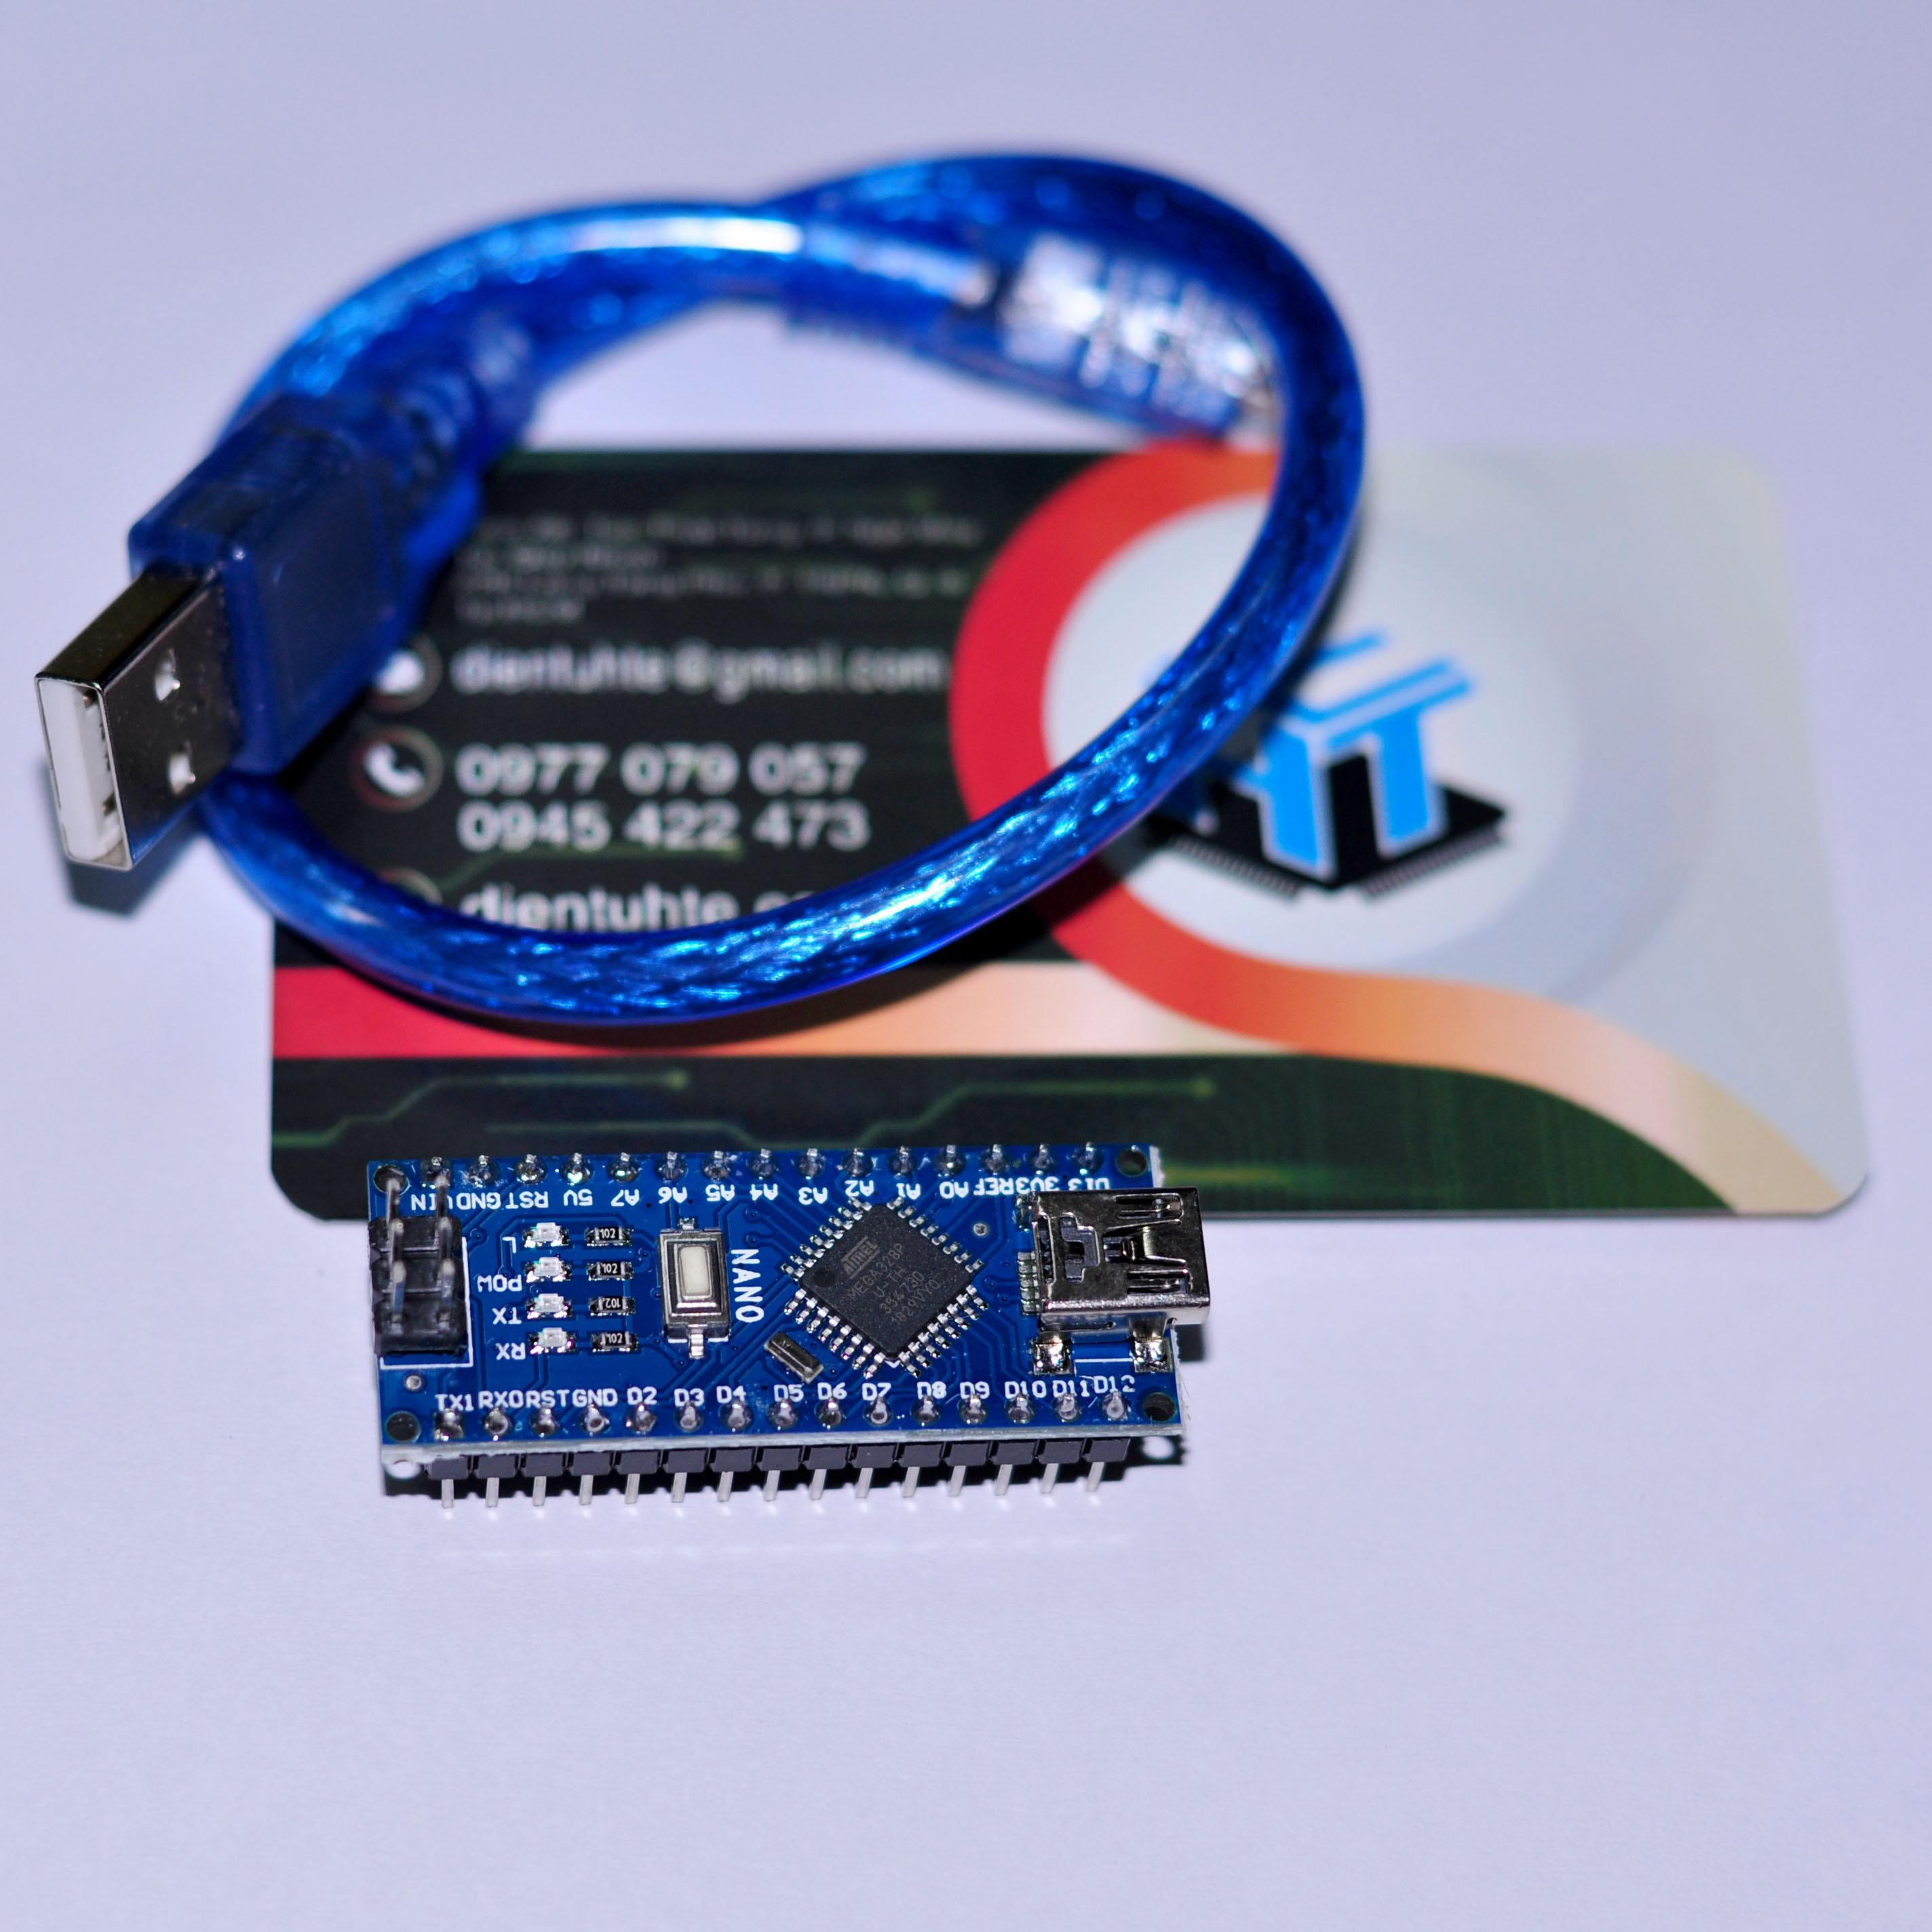 Kit Arduino nano CH340 - Kèm cáp USB mini